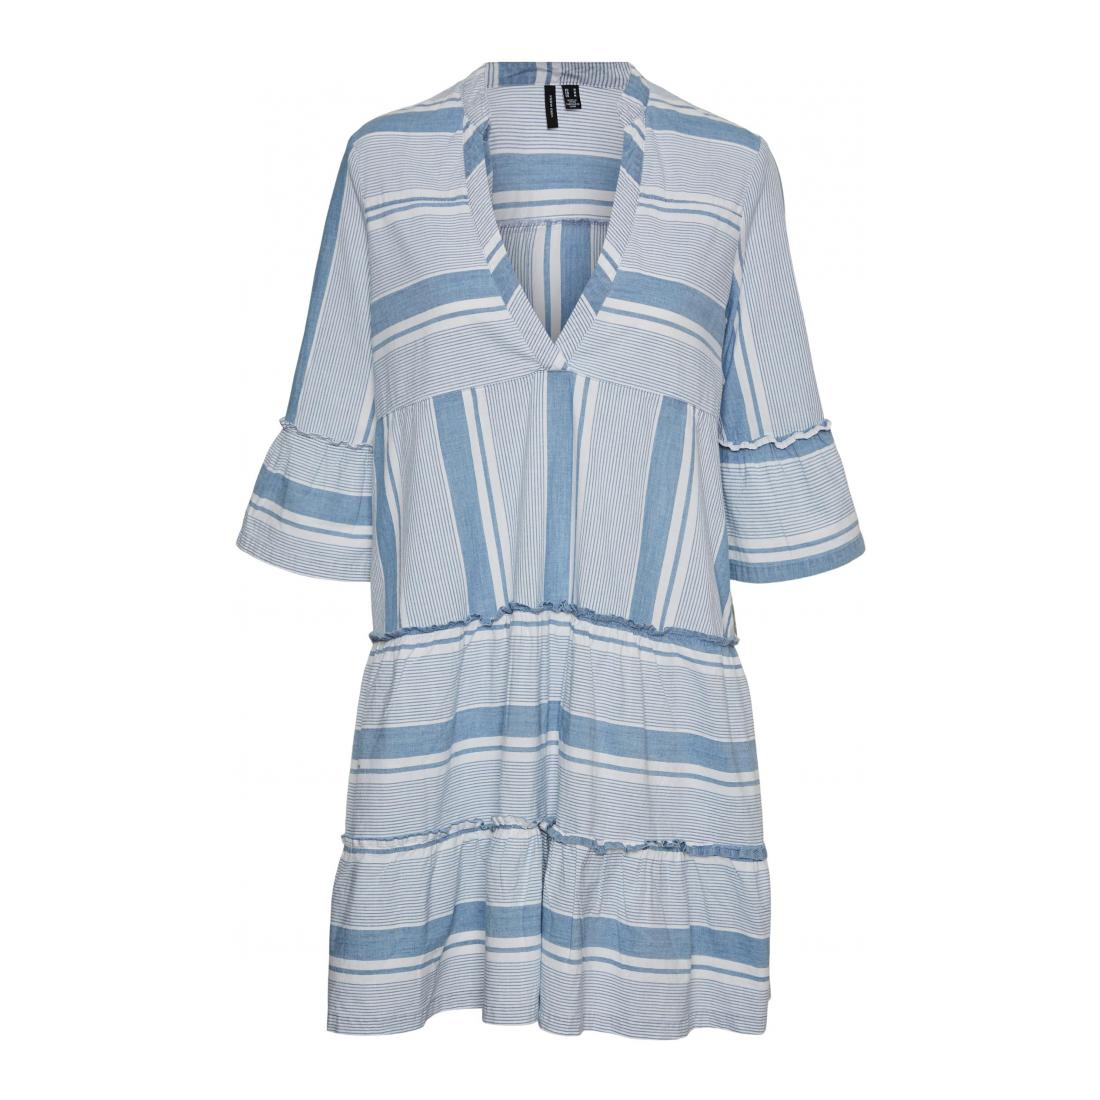 Vero Moda Kleider kurz Damen VMAKELA 3/4 CHAMBRAY TUNI